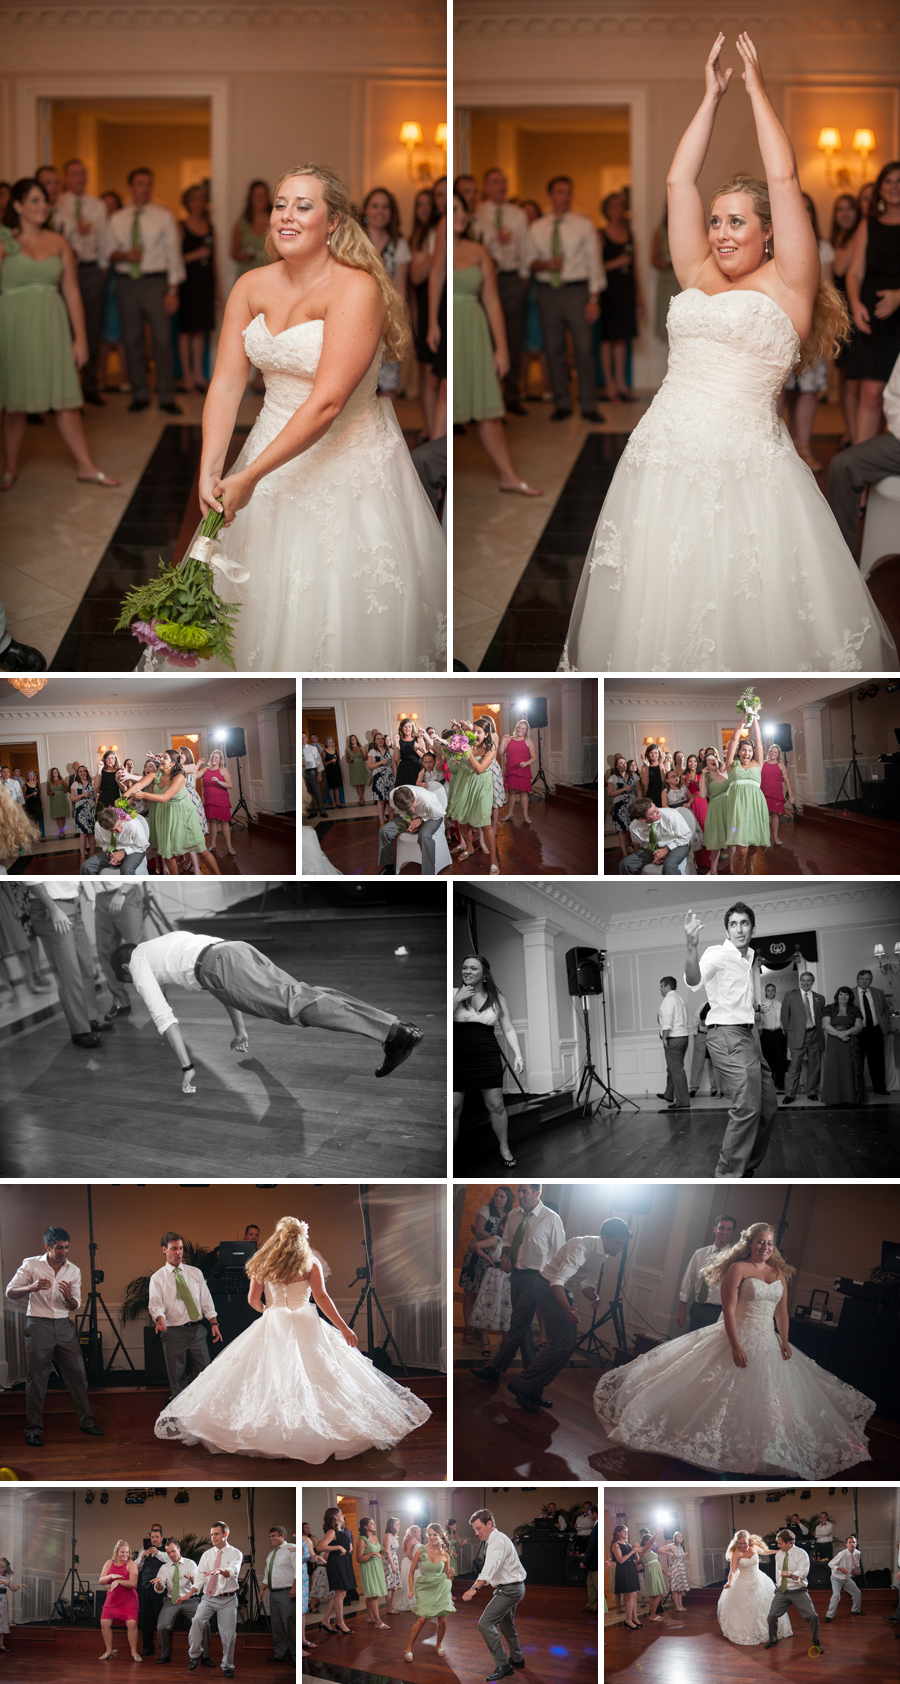 TRICIA  GREG  wedding in Sumter SC  ODonnell House Wedding  Joshua Aaron Photography